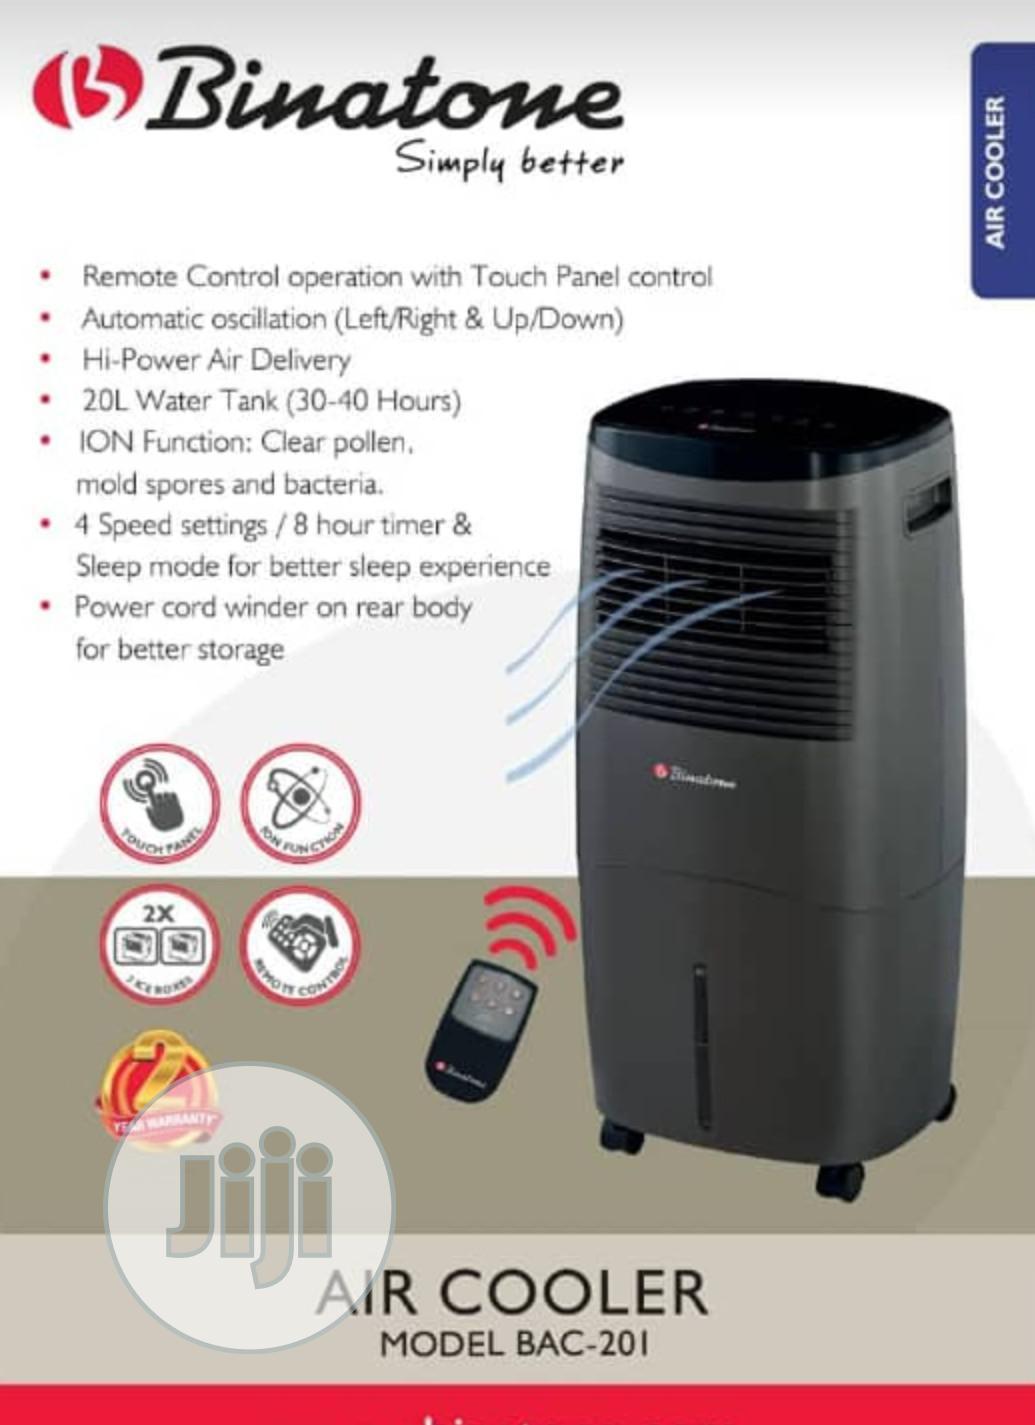 Binatone Air Cooler BAC-201